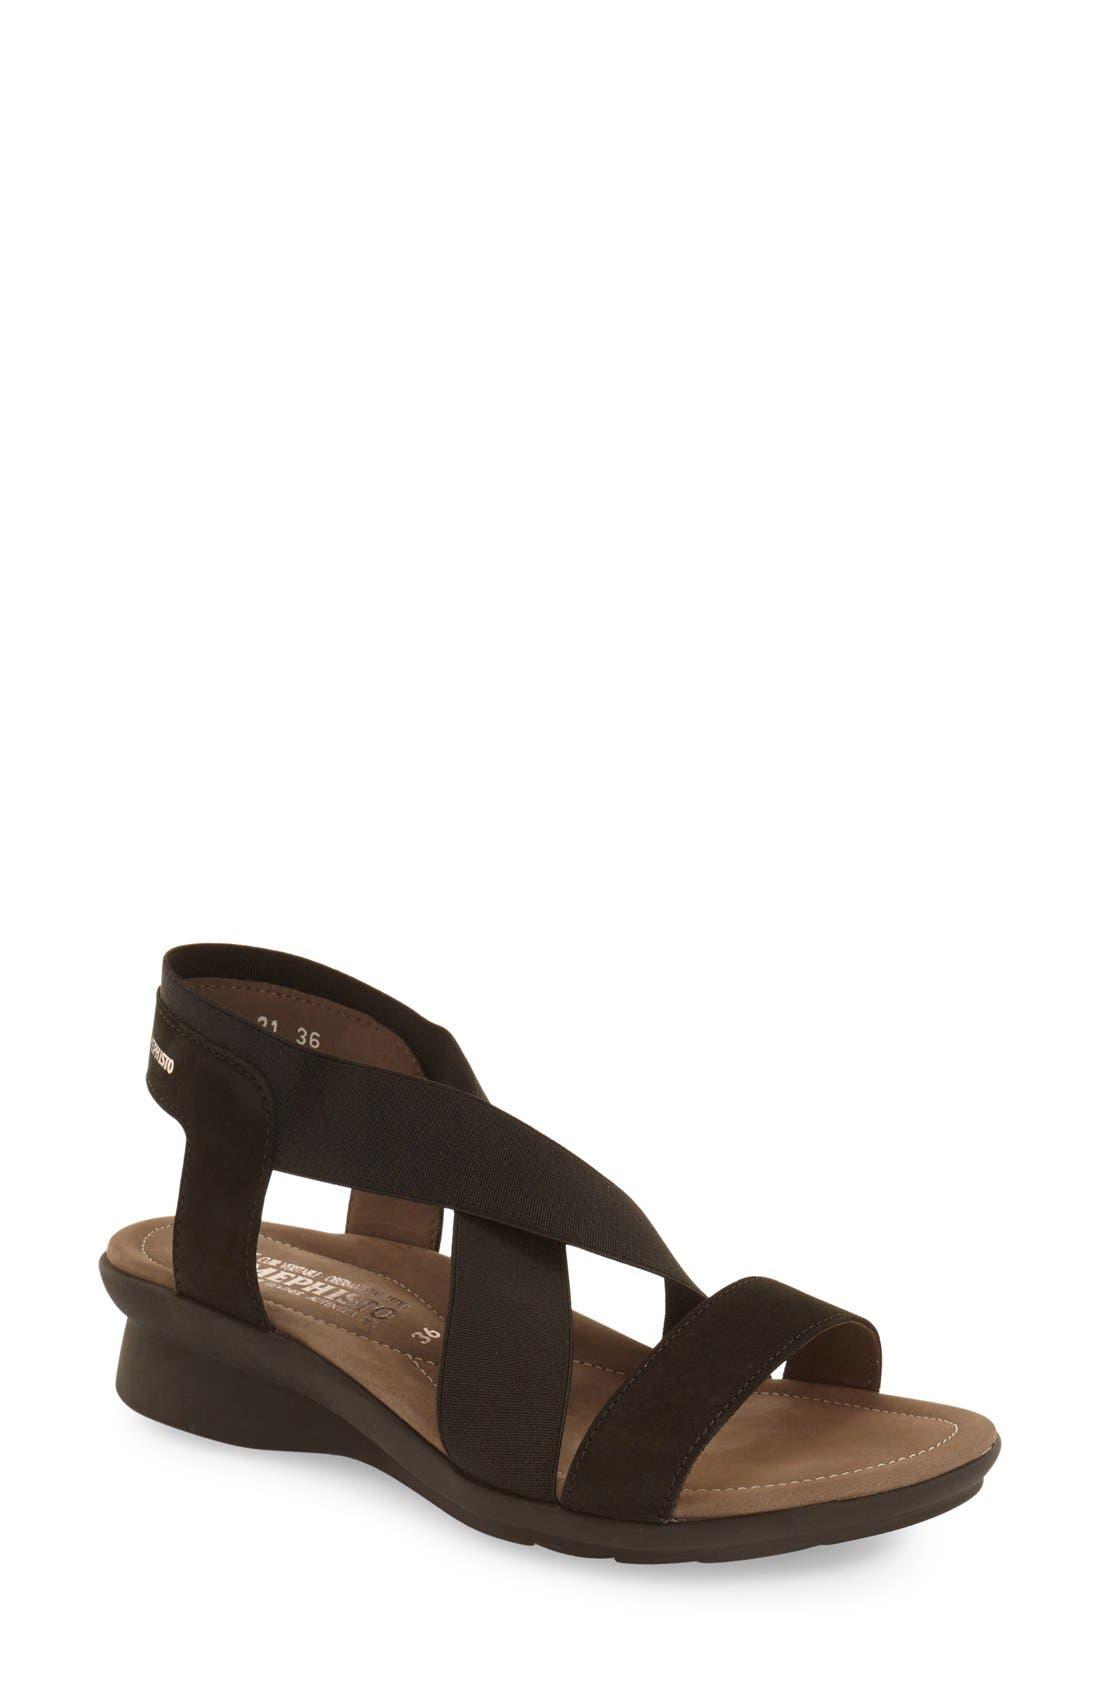 'Pastora' Sandal,                             Main thumbnail 1, color,                             002